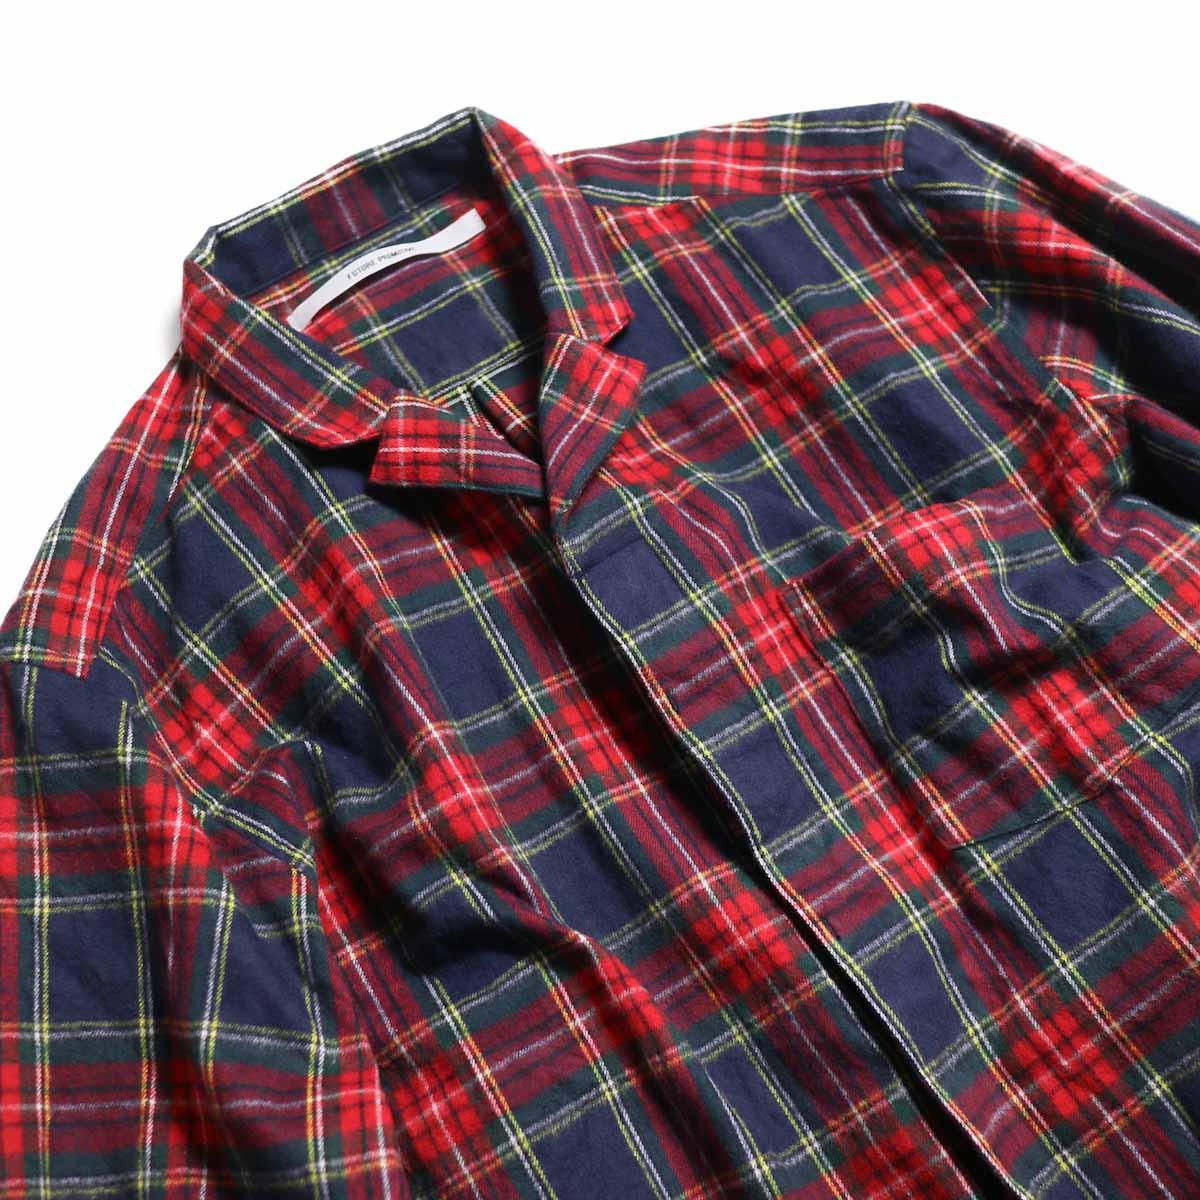 FUTURE PRIMITIVE / FP Notched Shirt(Tartan) -Navy 首元